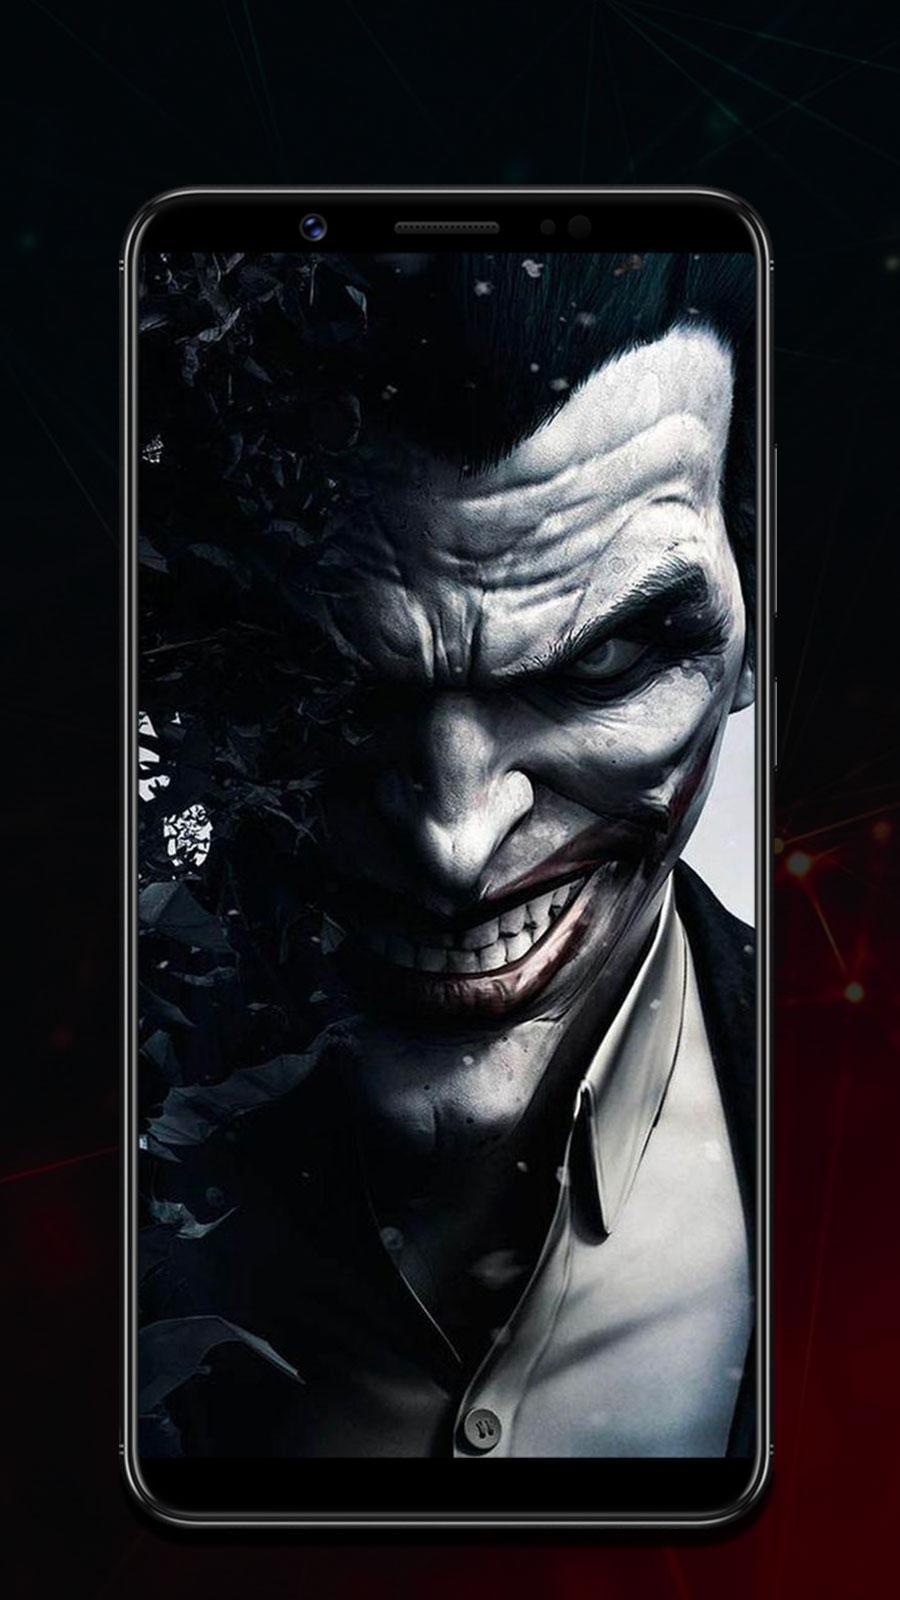 Unduh 300 Wallpaper Hd Android Batman Joker  Terbaik